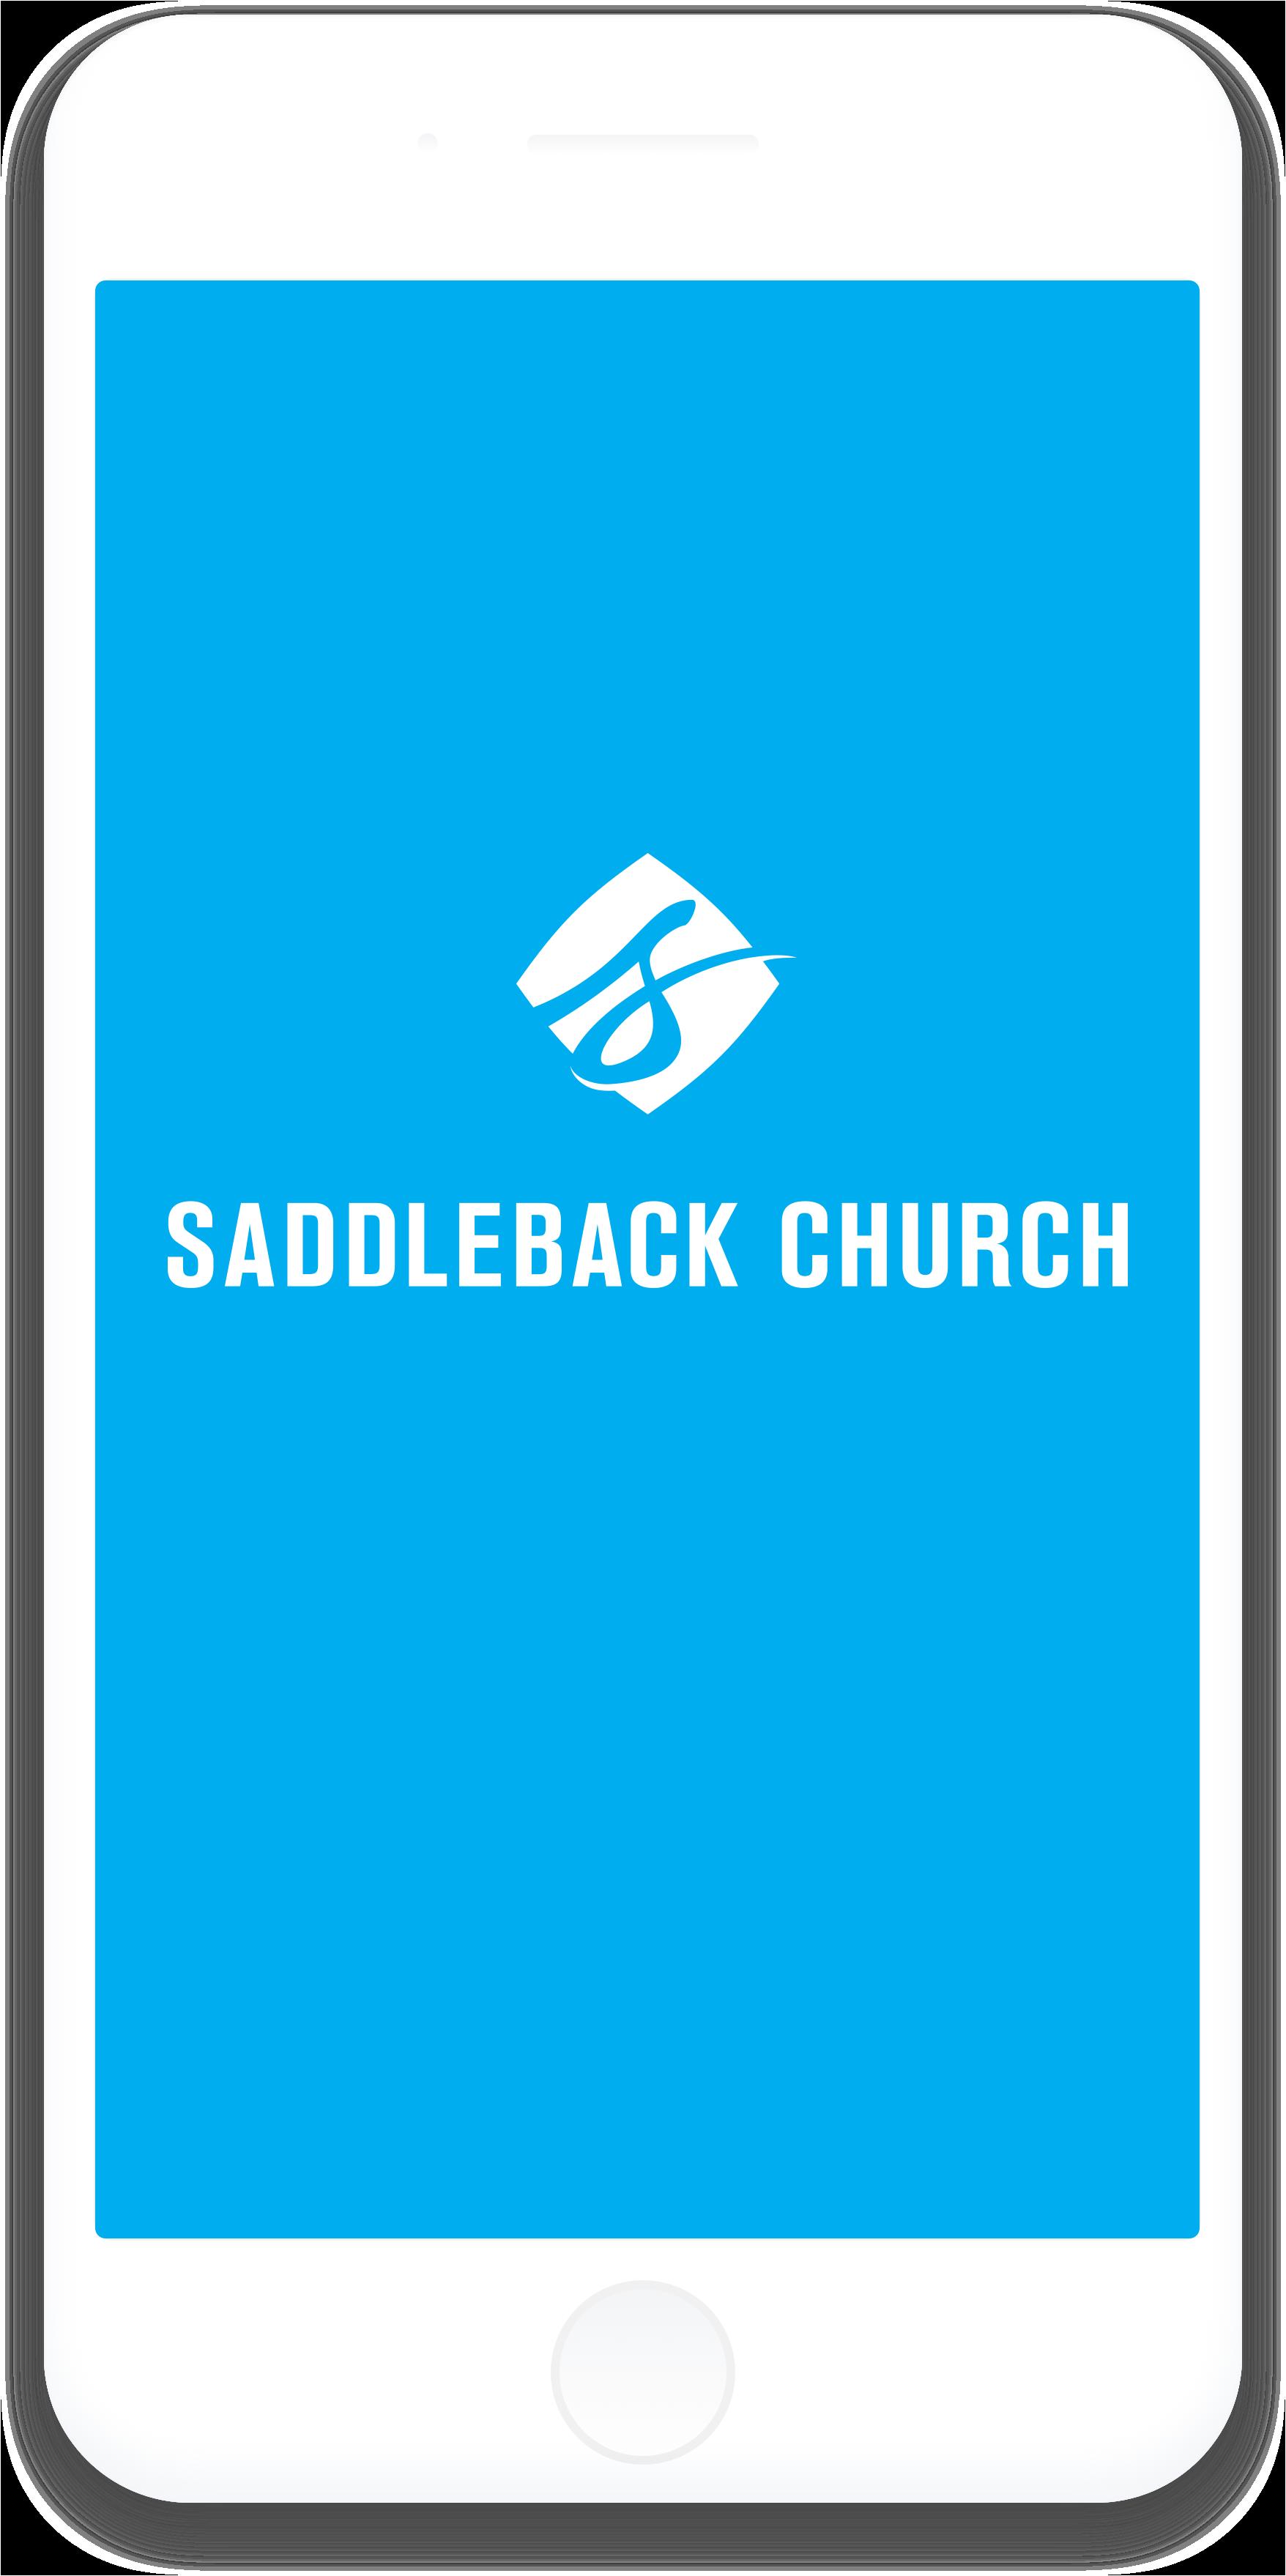 saddleback church campus map Lake Forest Campus saddleback church campus map